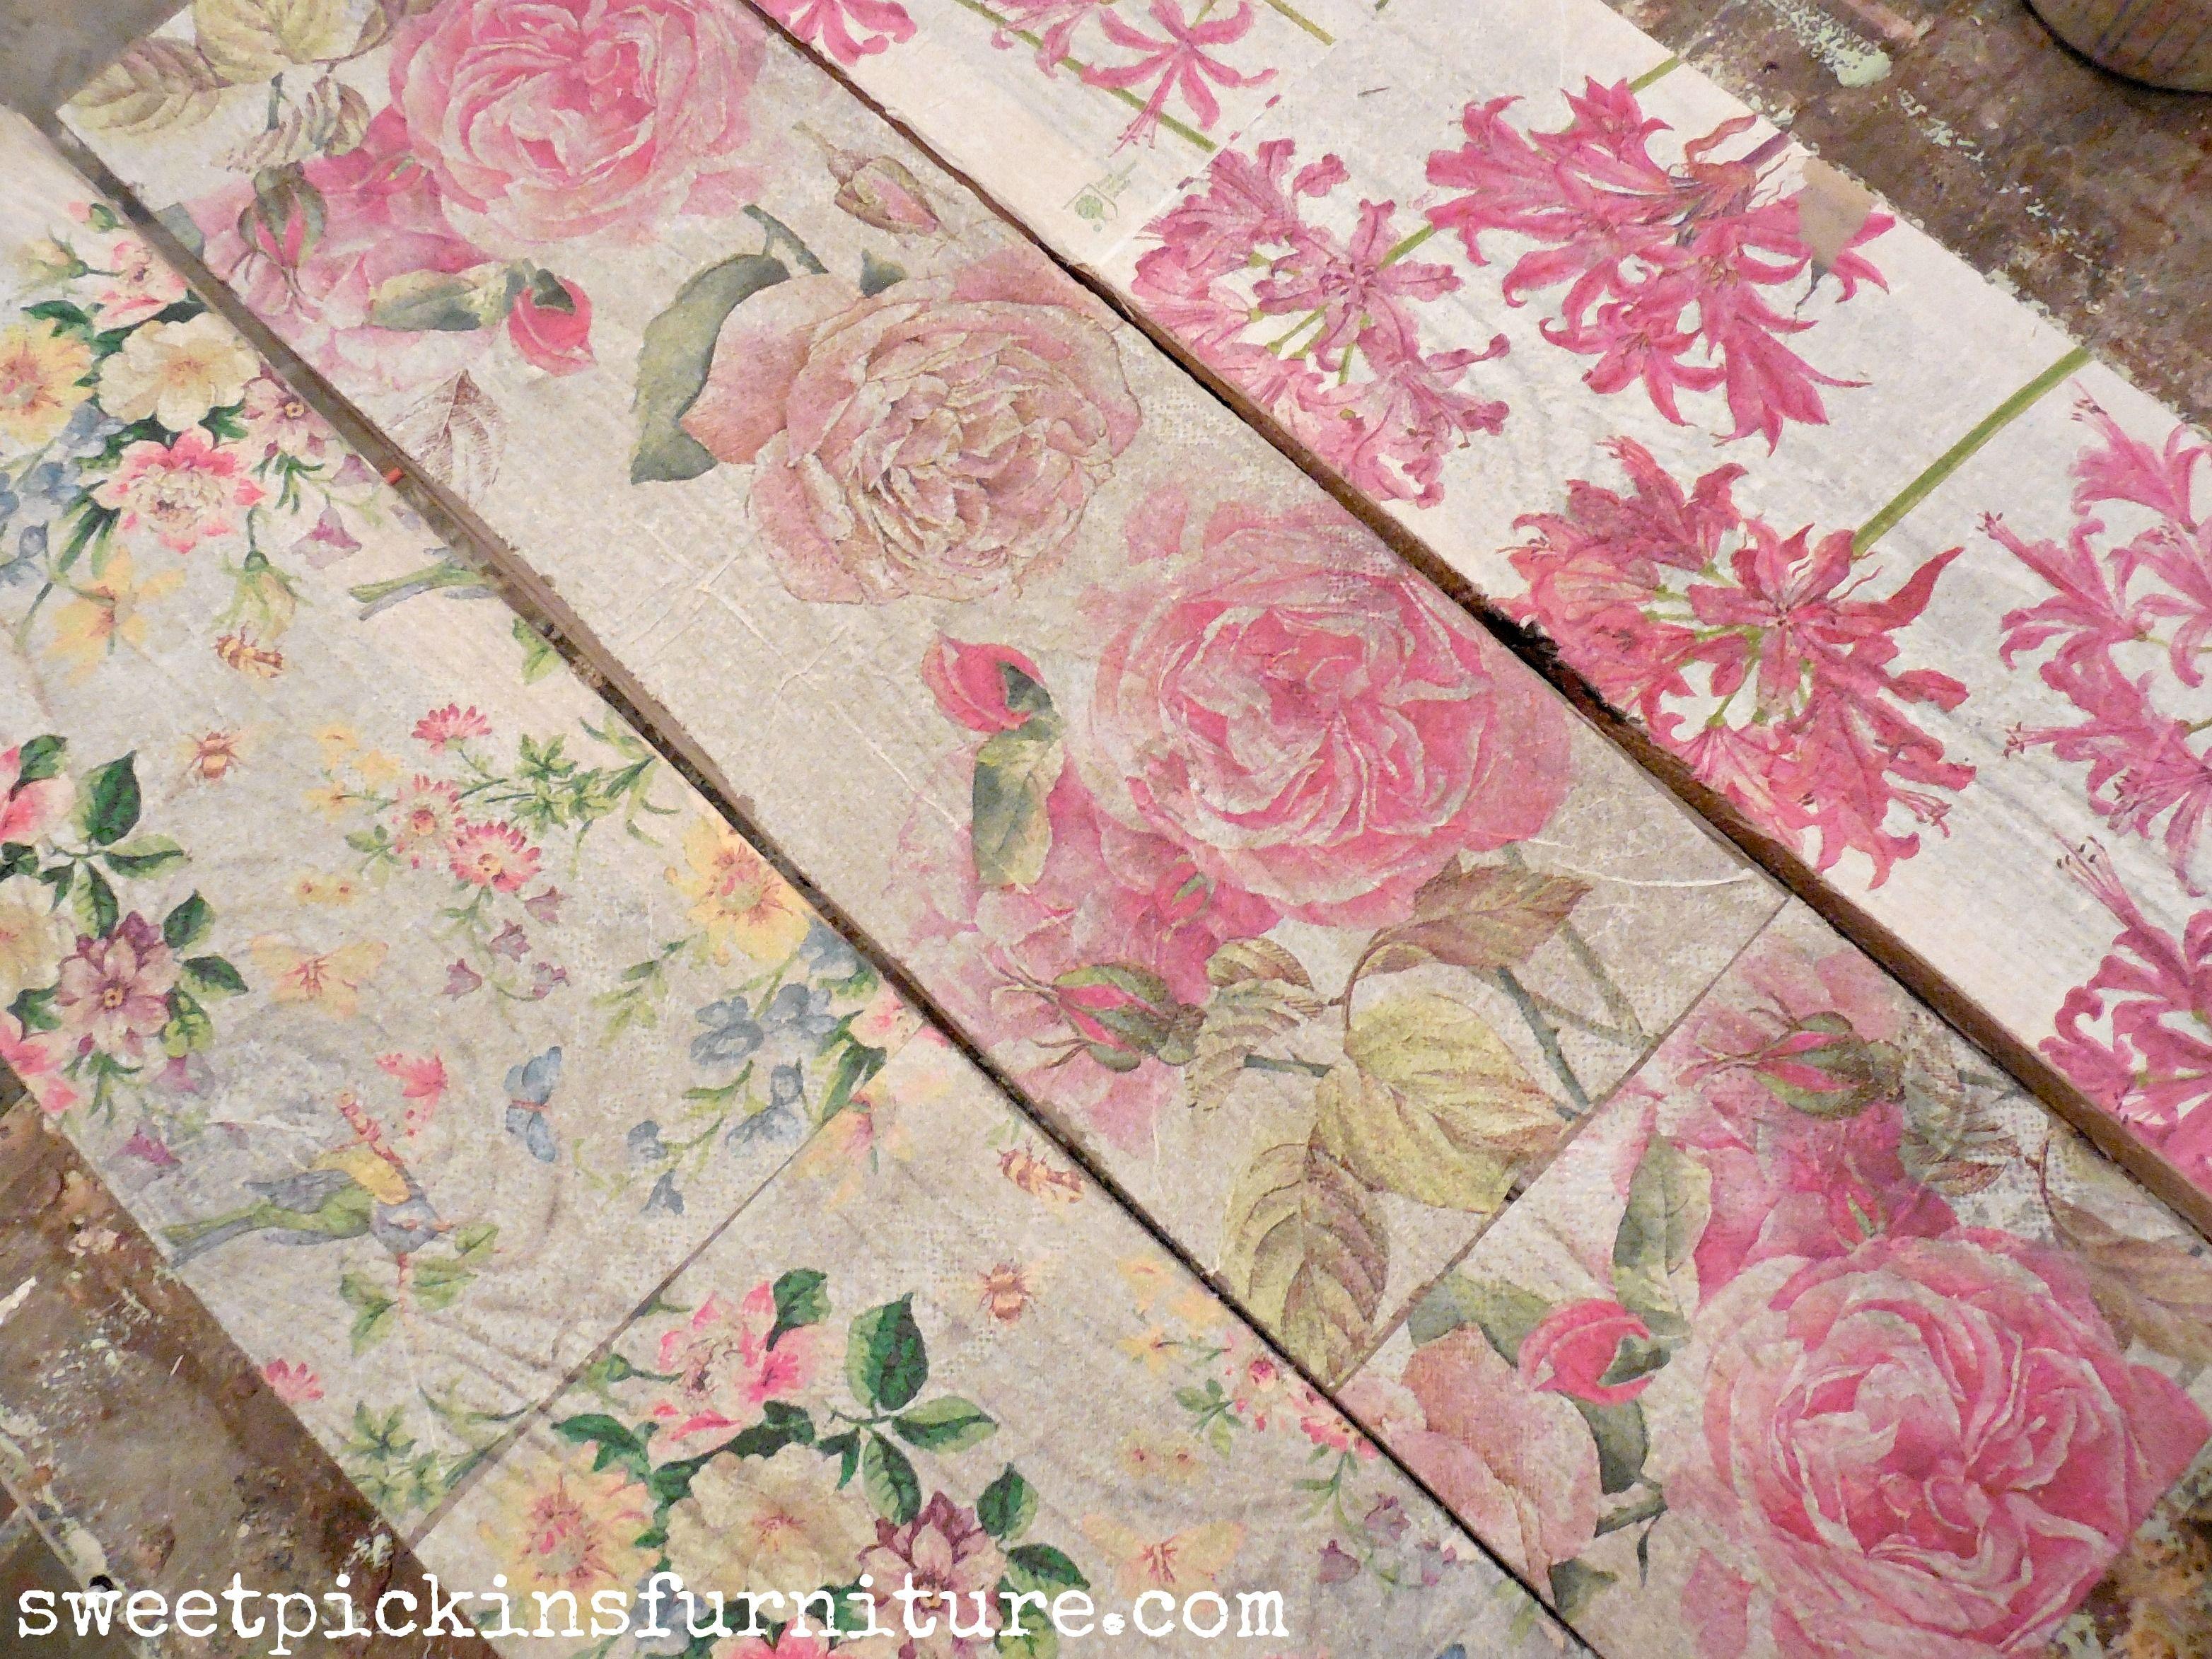 sweet pickins napkins on wood floral wood tutorial using napkins - Decorative Paper Napkins